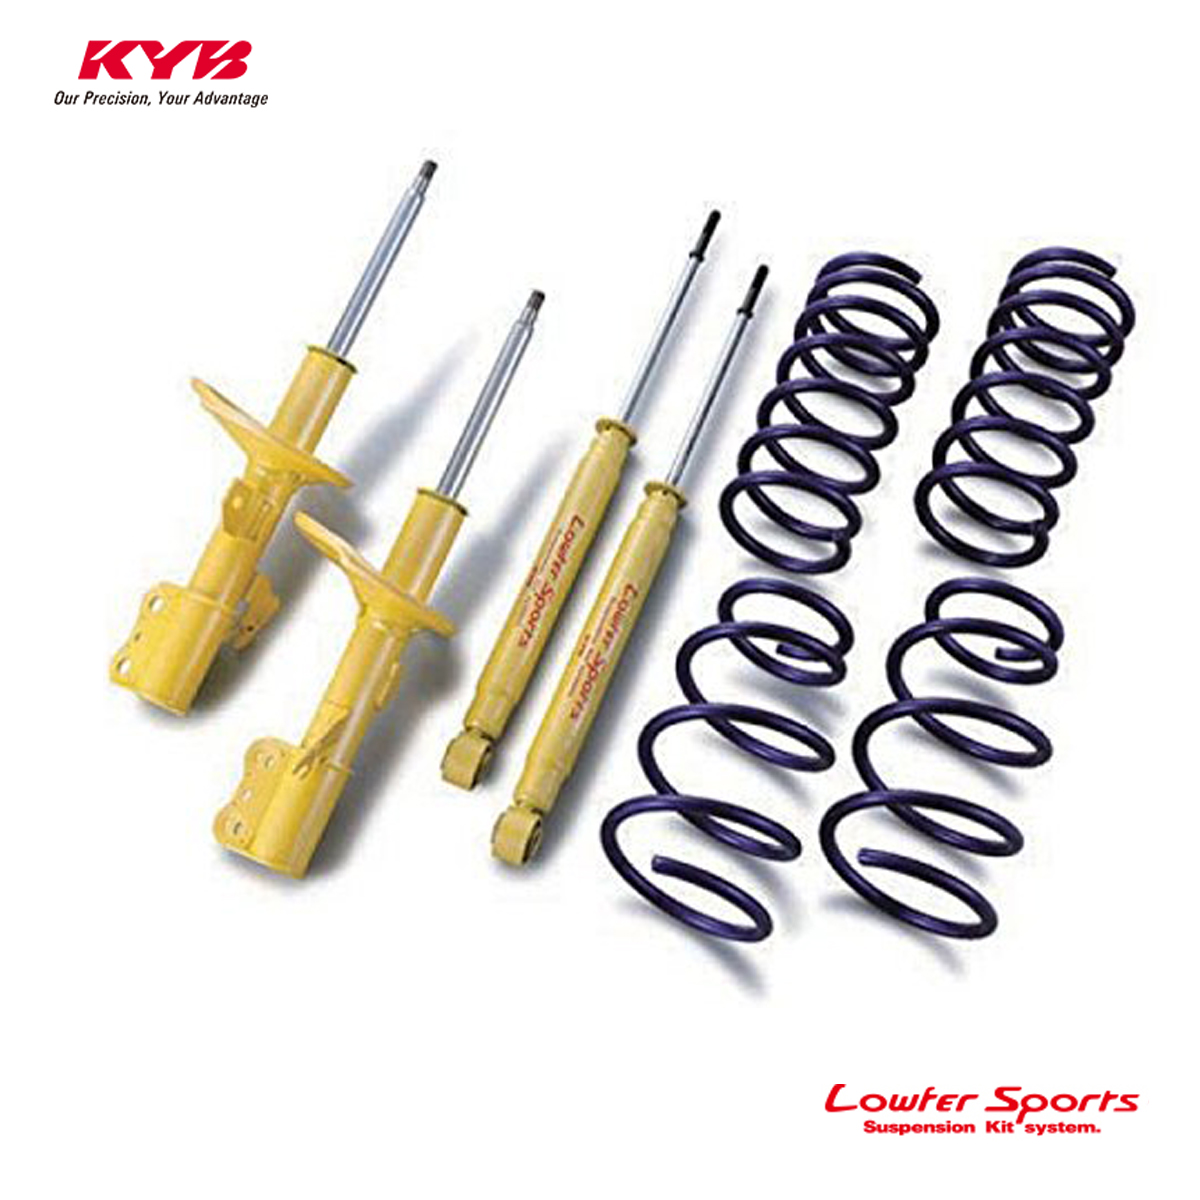 KYB カヤバ エスティマT MCR40W ショックアブソーバー サスペンションキット Lowfer Sports LKIT-MCR40W 配送先条件有り